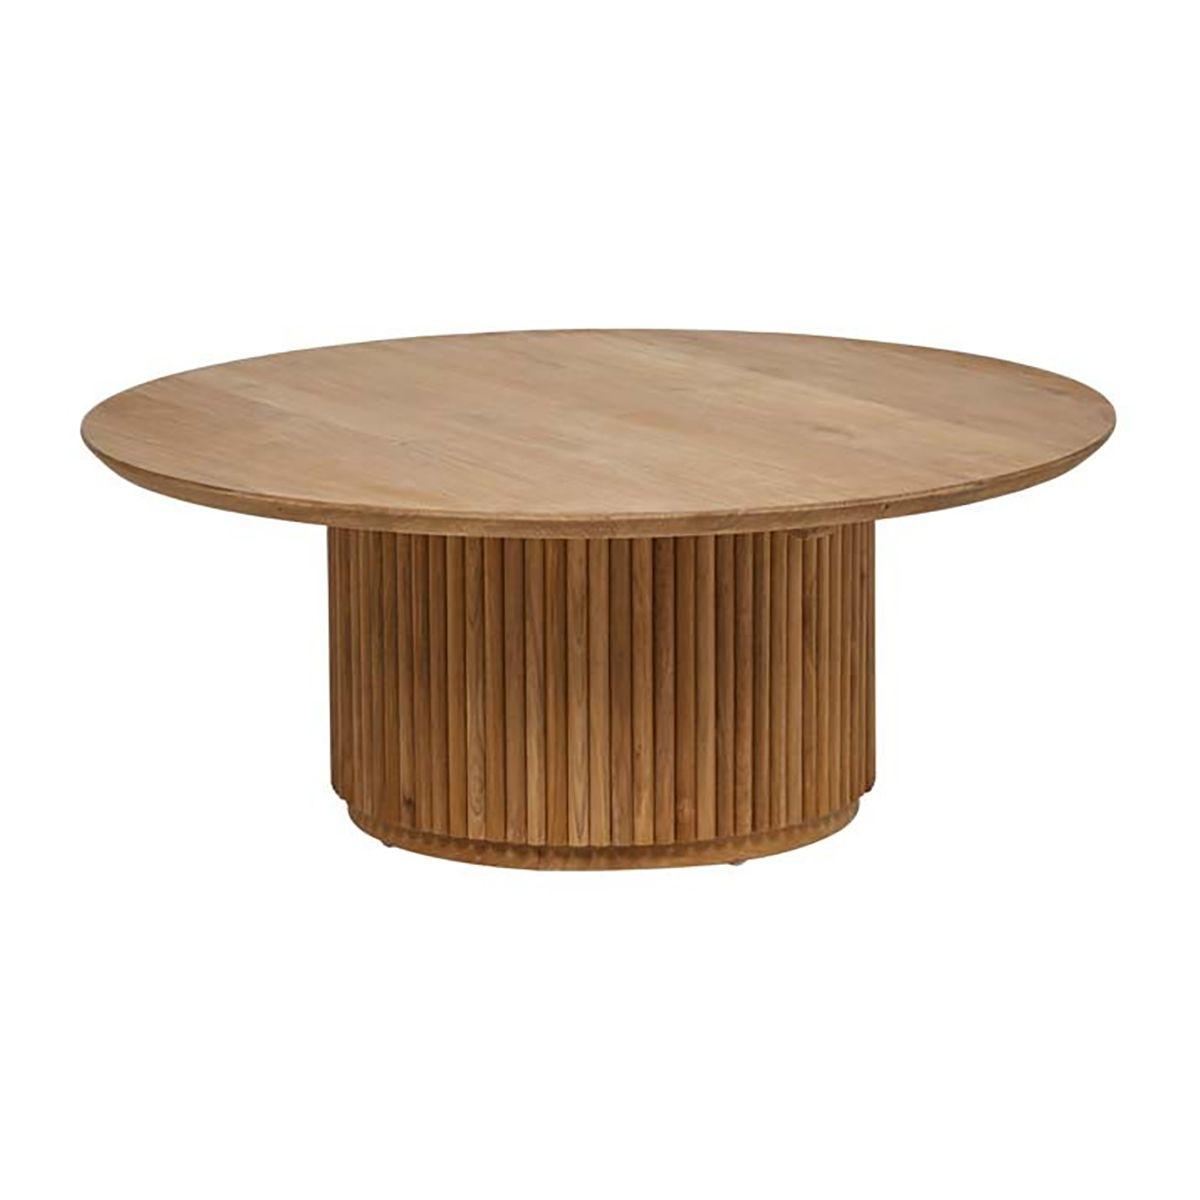 Tully Coffee Table Teak Coffee Table Coffee Table Coffee Table Furniture [ 1200 x 1200 Pixel ]